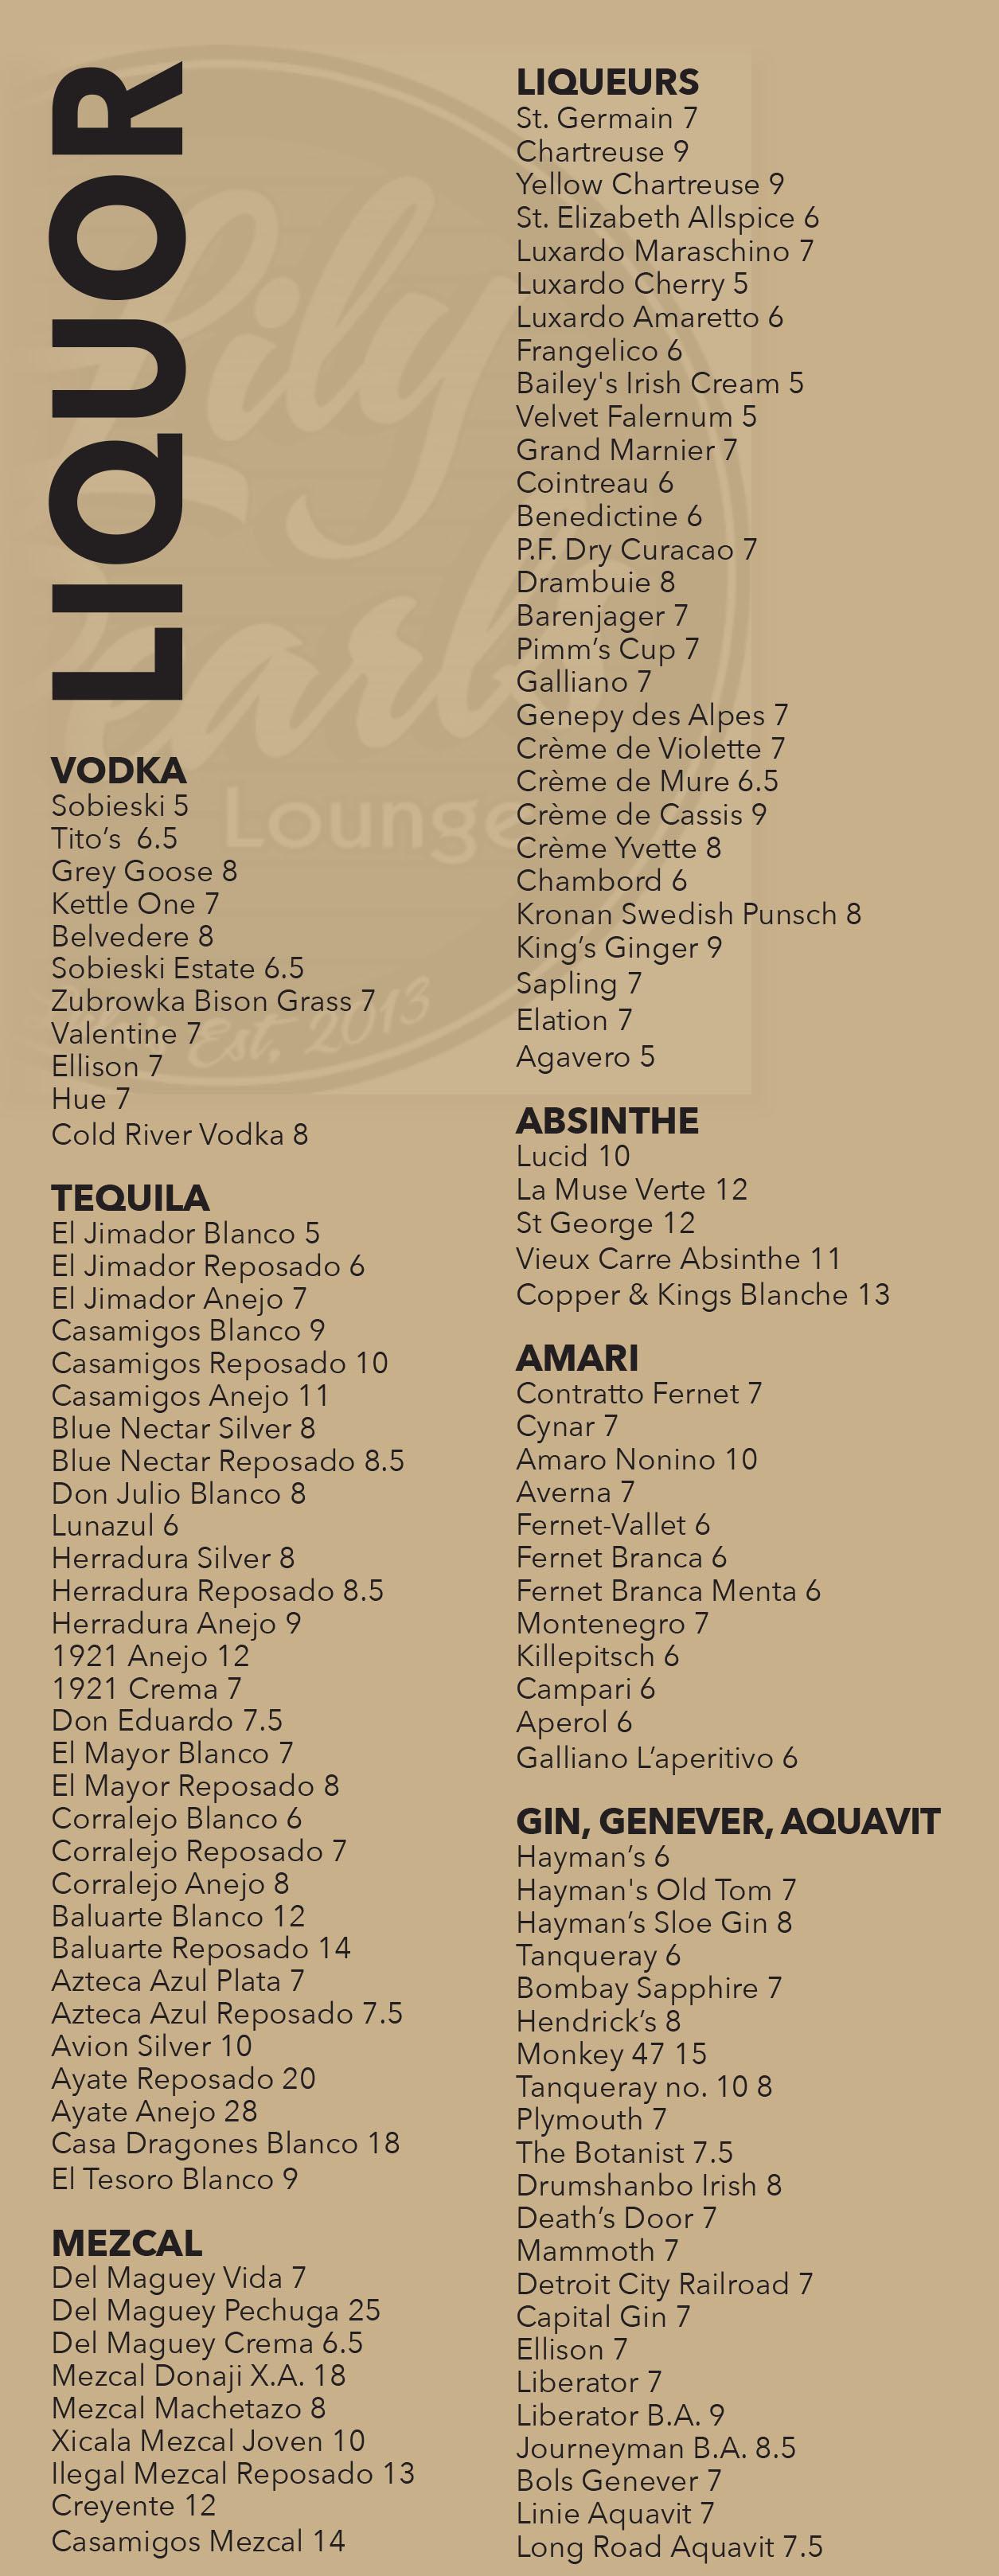 lilly pearl liquor menu back.jpg